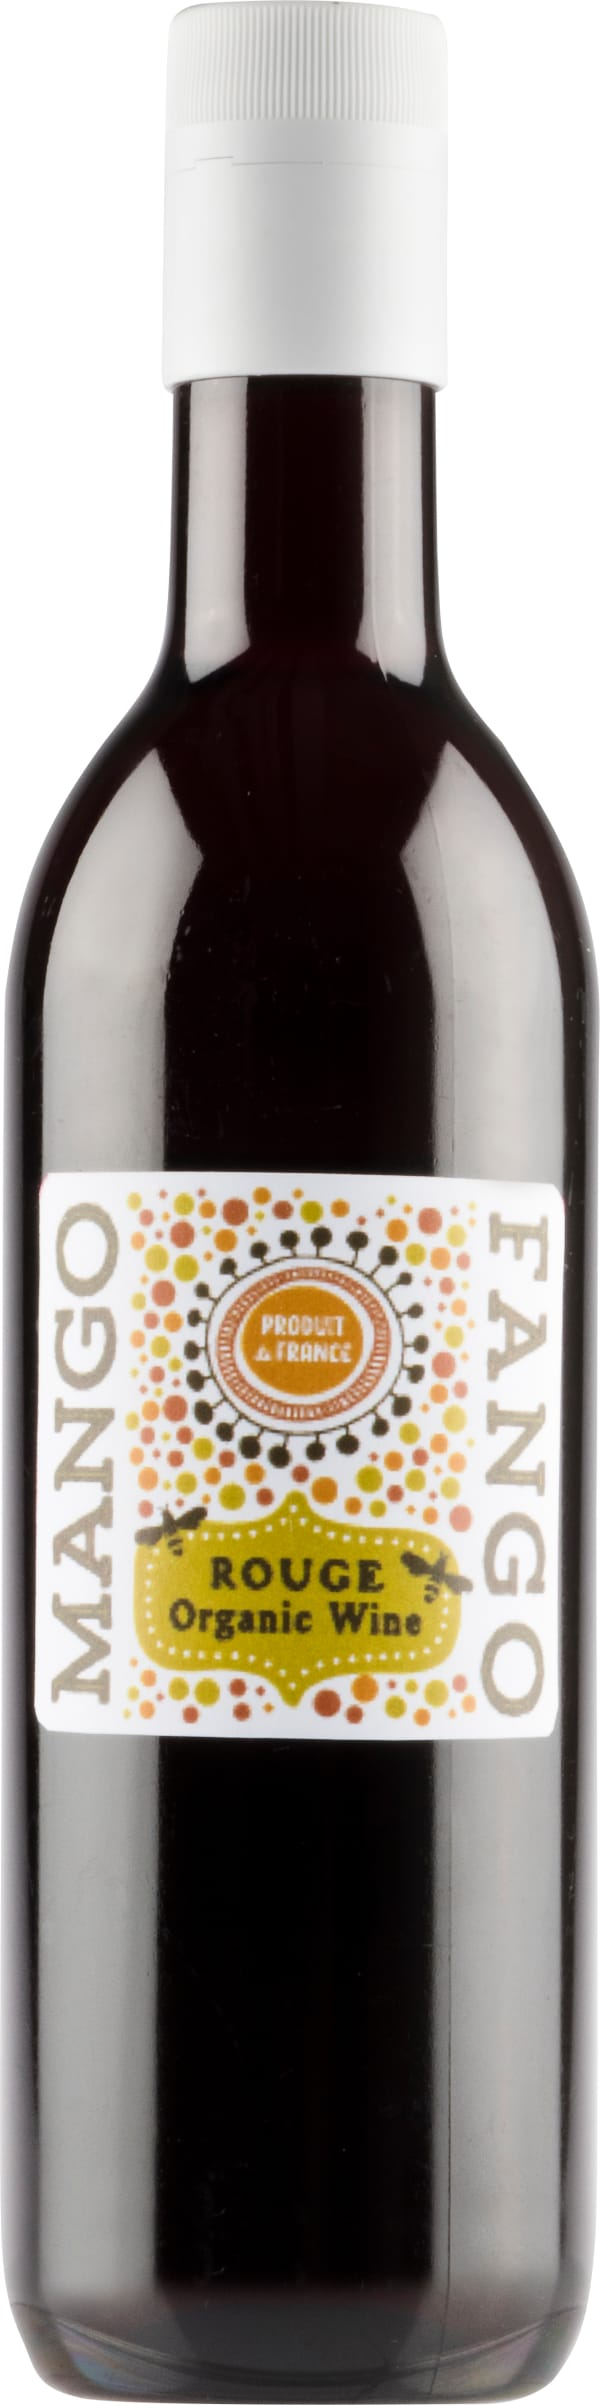 Mango Fango Grenache Shiraz Organic 2017 plastic bottle